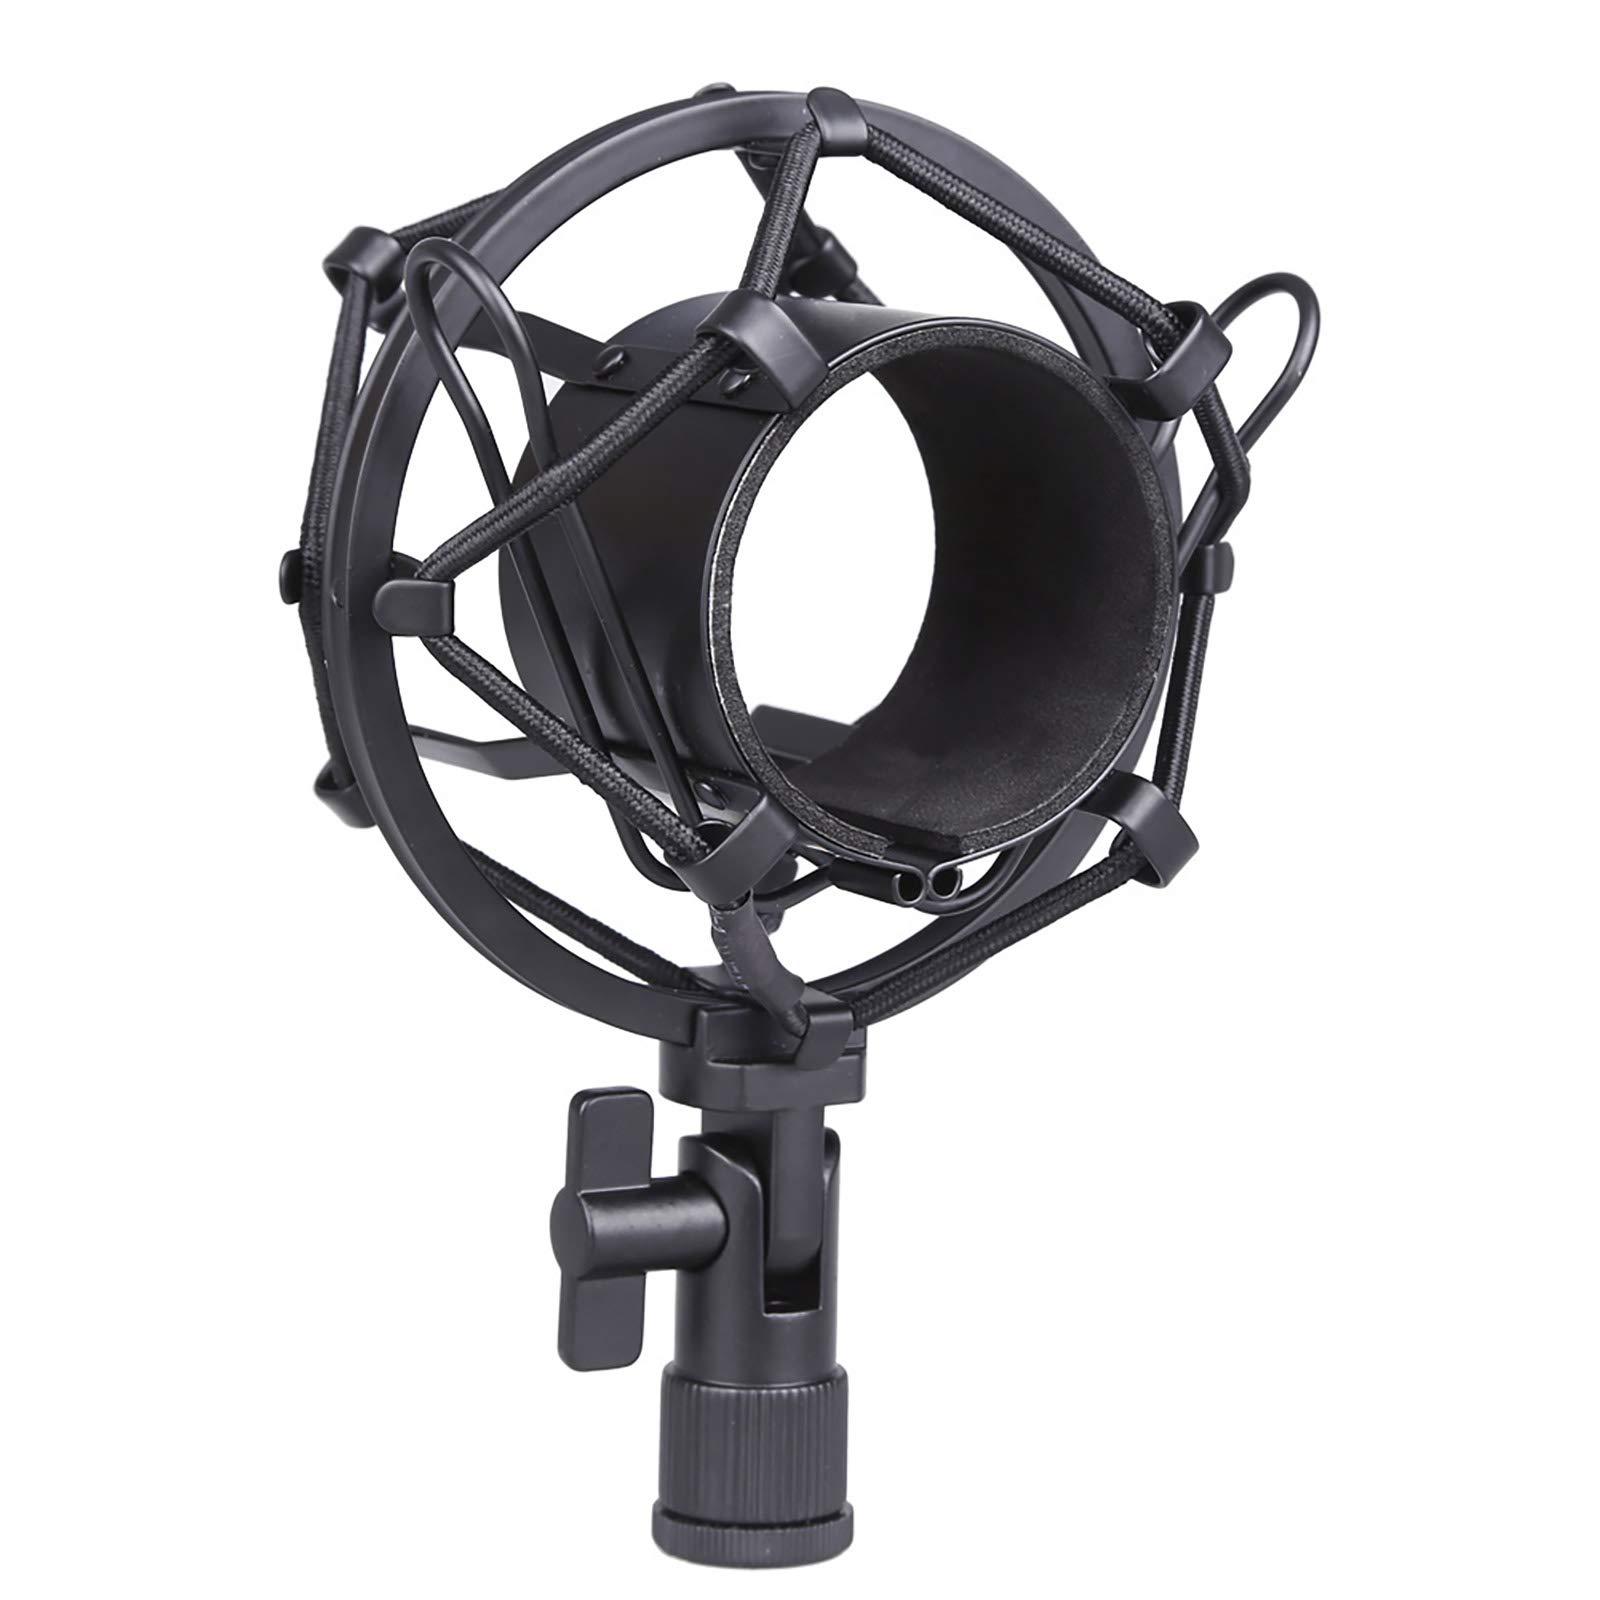 Koolertron Universal 50MM Microphone Shock Mount for 48MM-54mm Diameter Condenser Mic (Black)